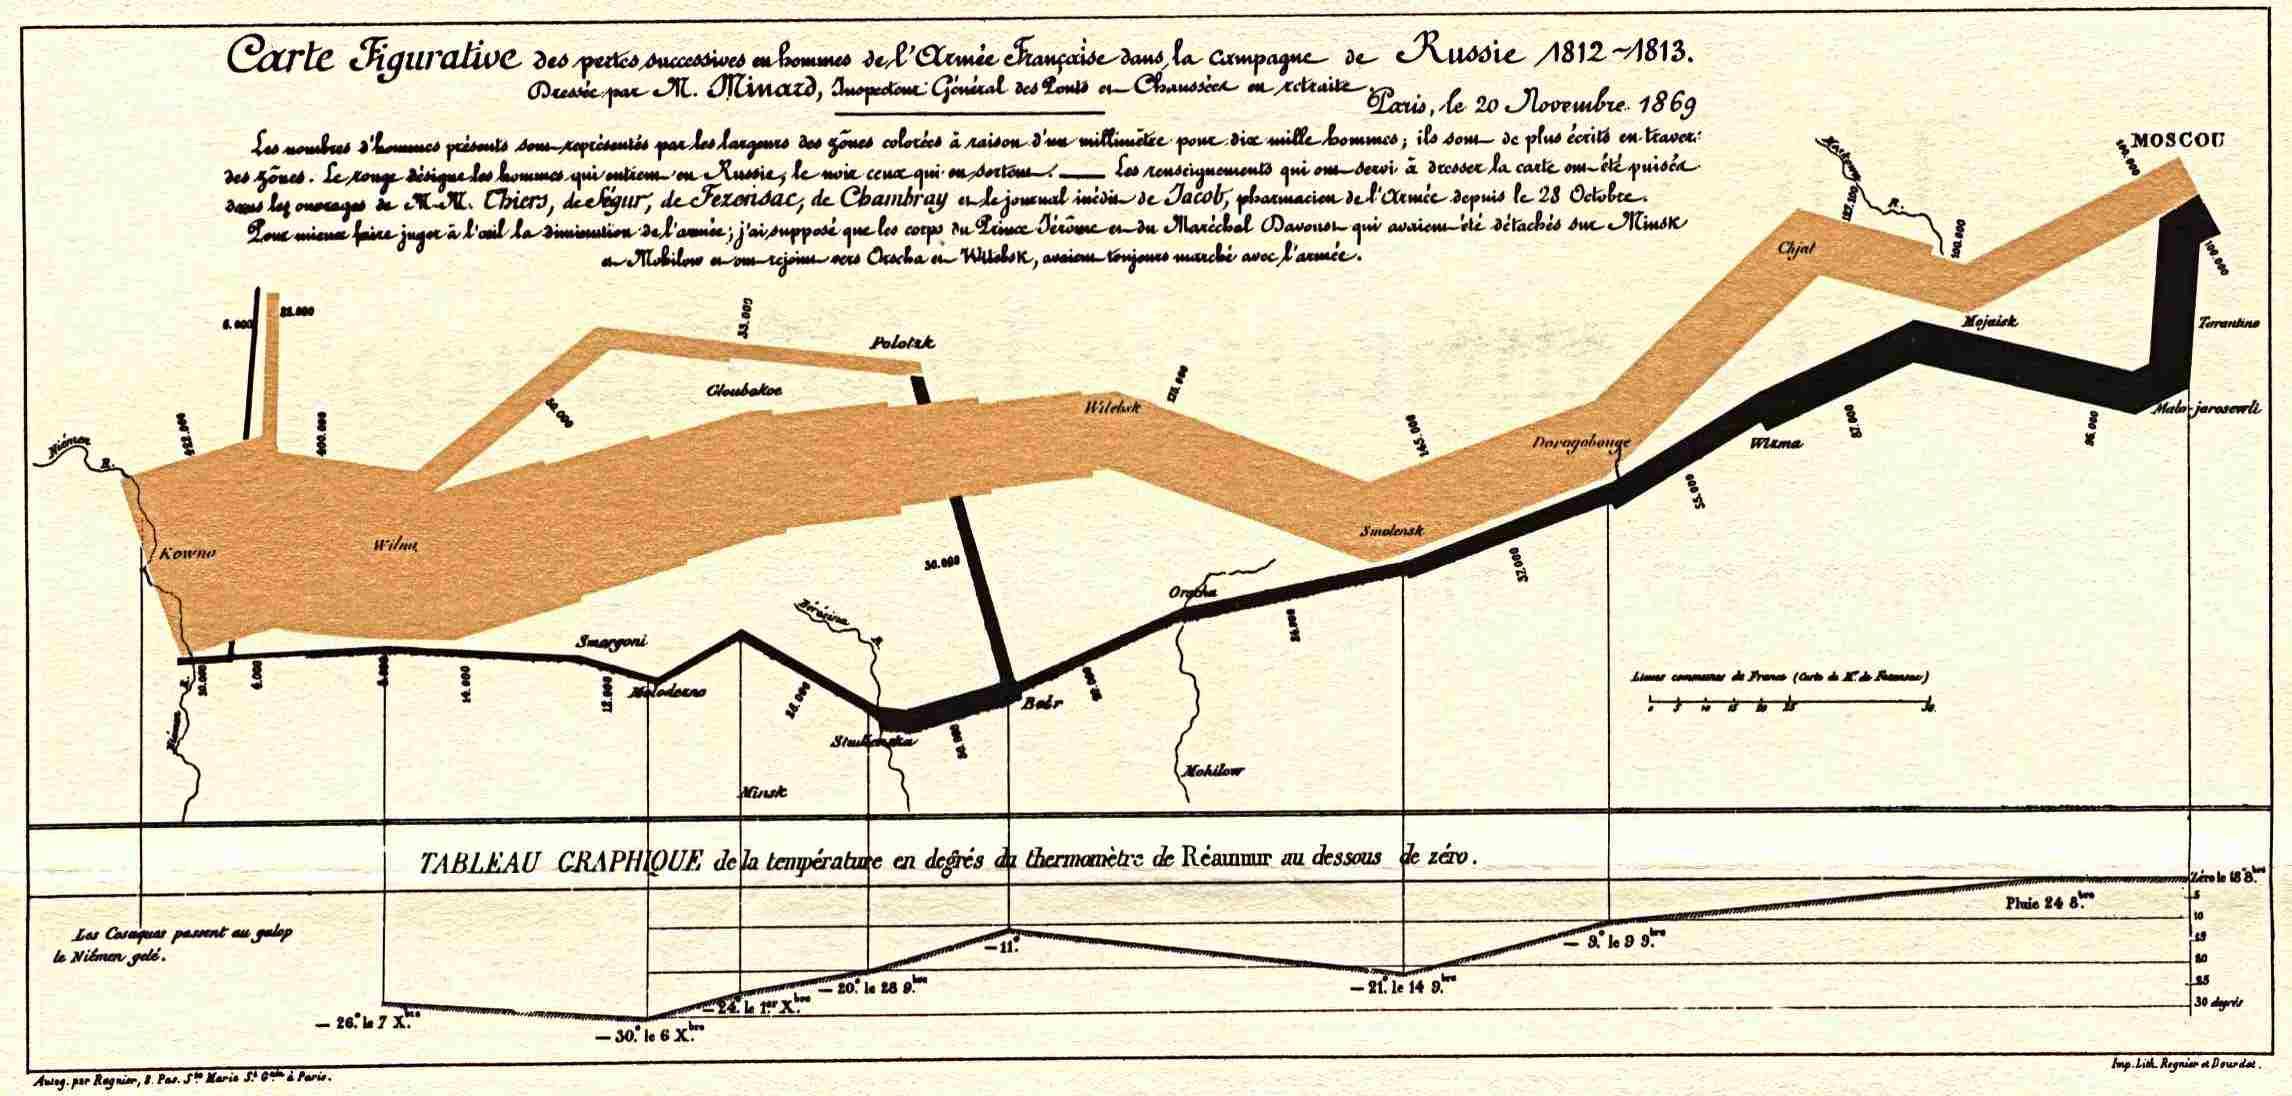 Visualizacion-Carta-Napoleon-Charles-Minard